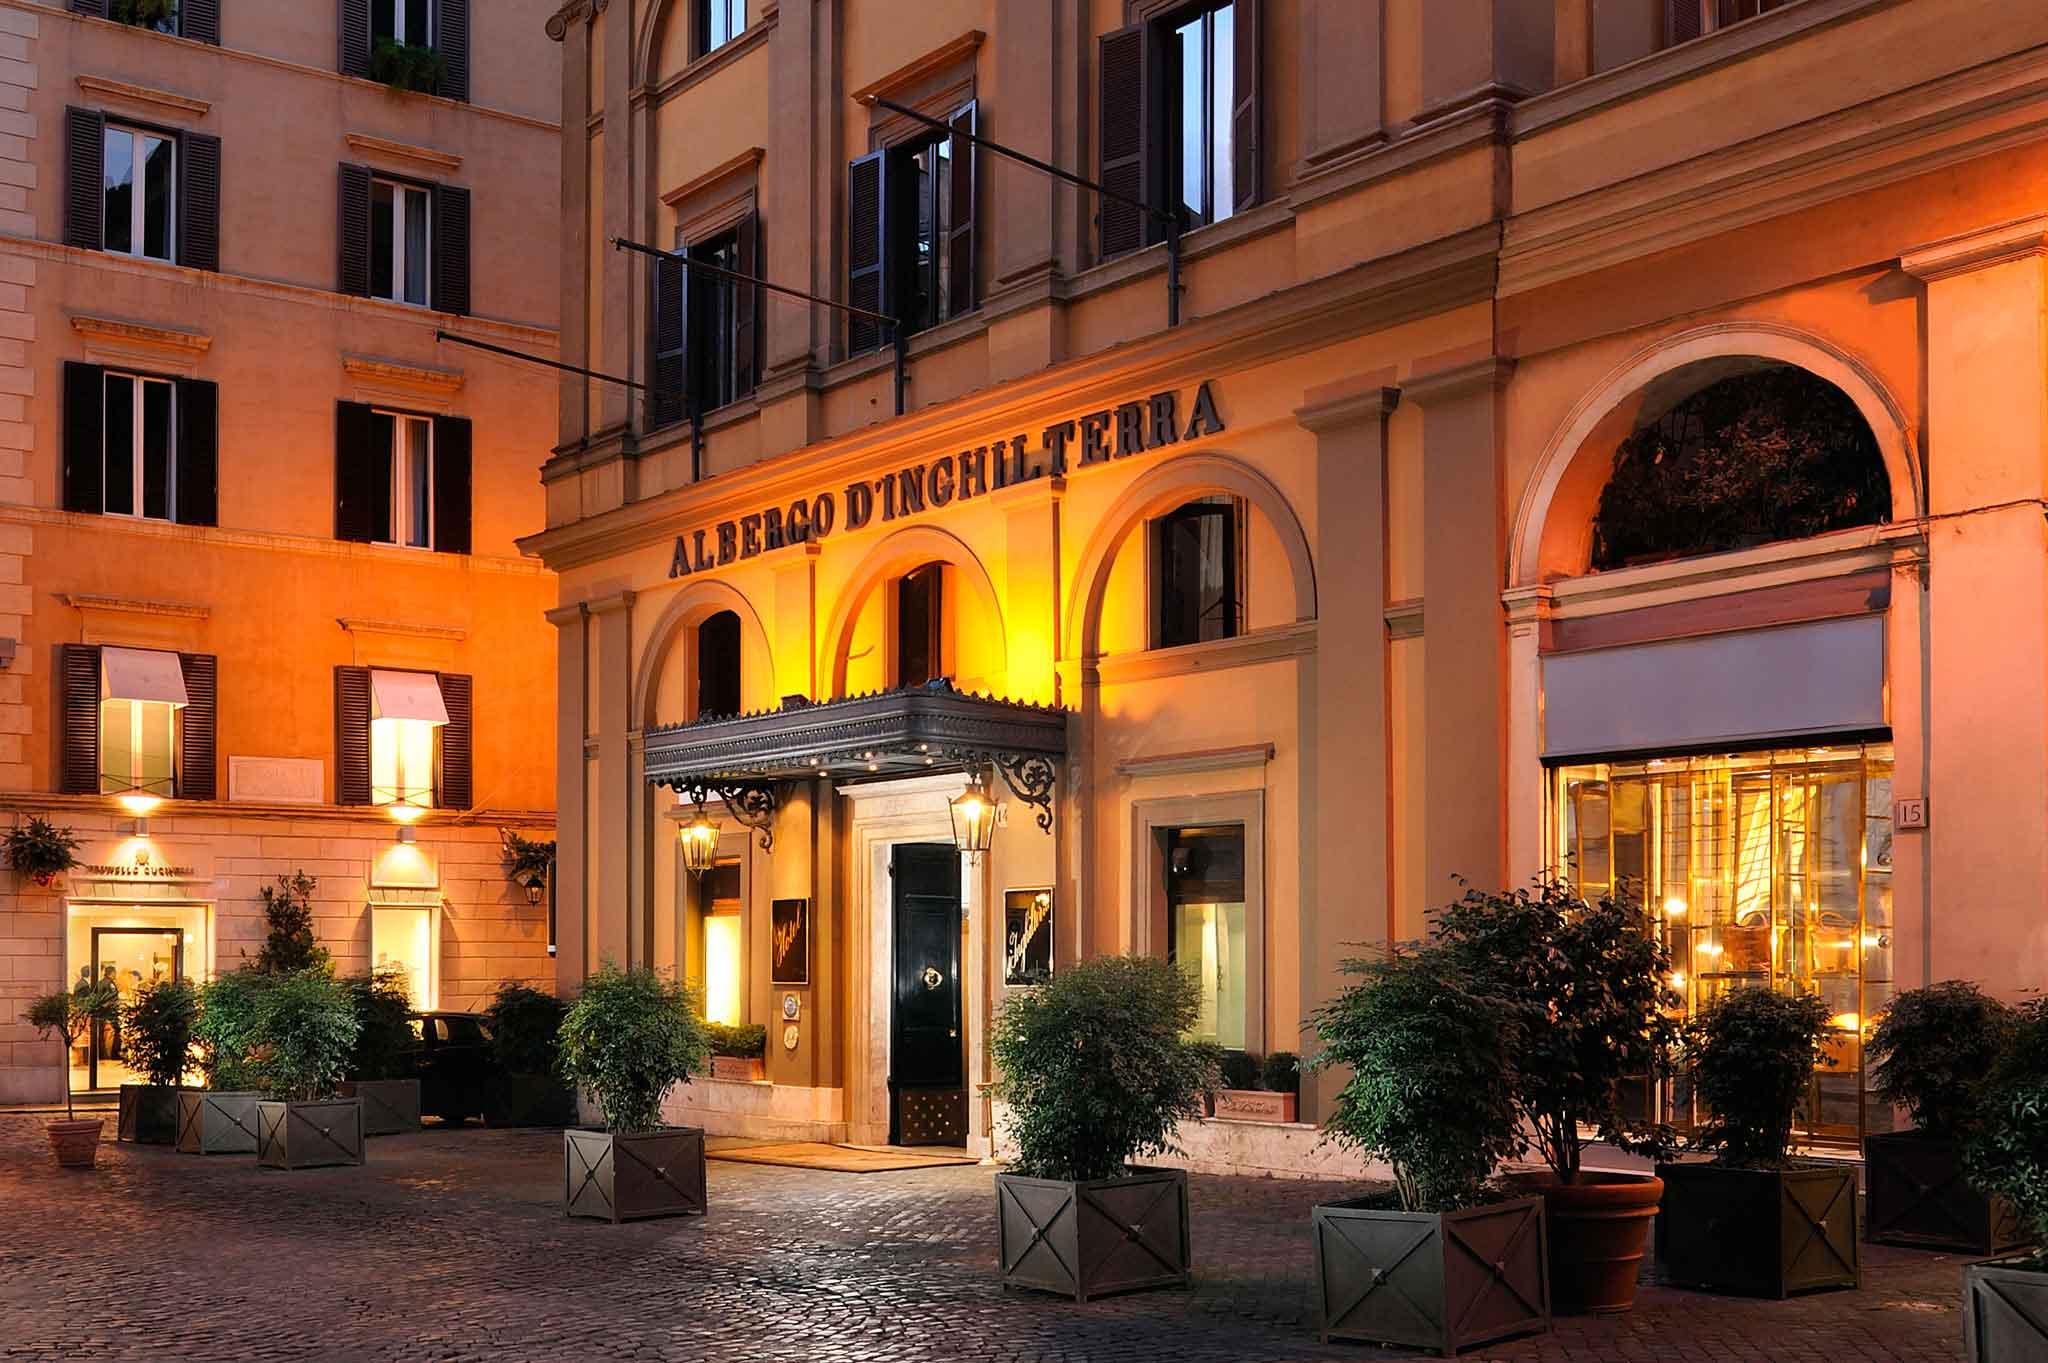 luxury-hotel-roma-hotel-d-inghilterra-exterior-view